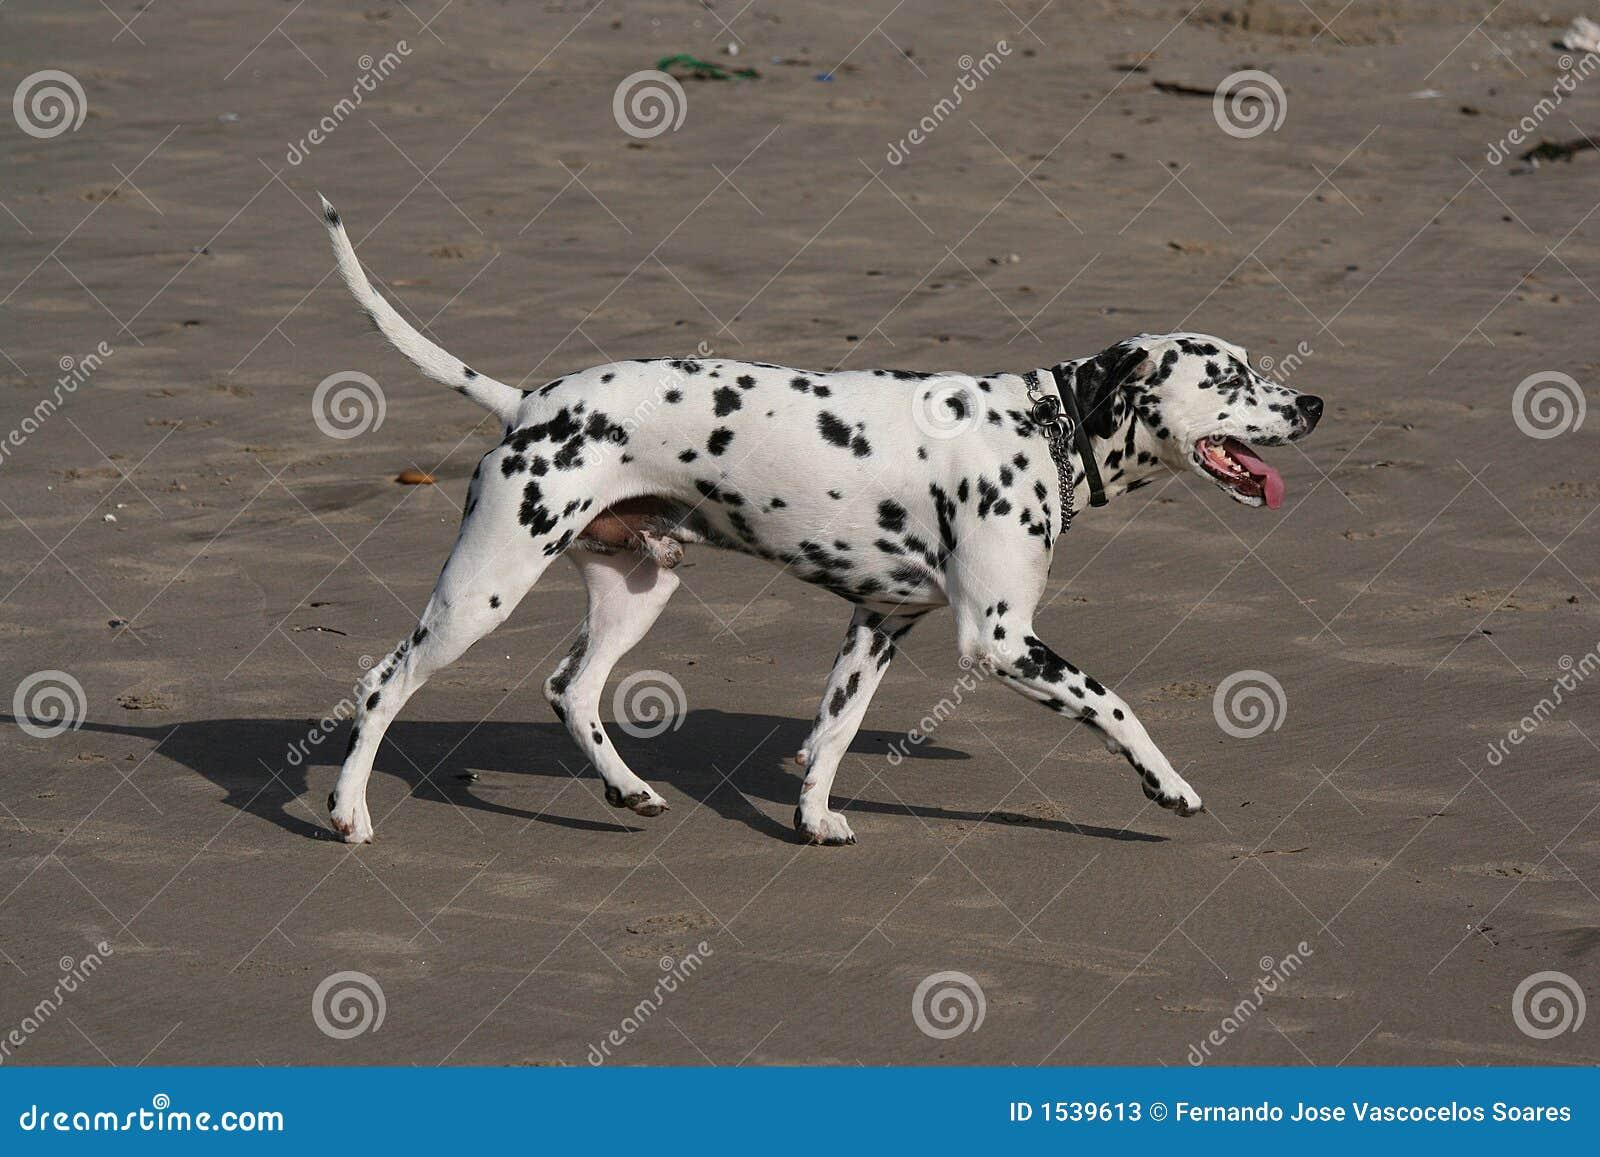 how to make a dog walk